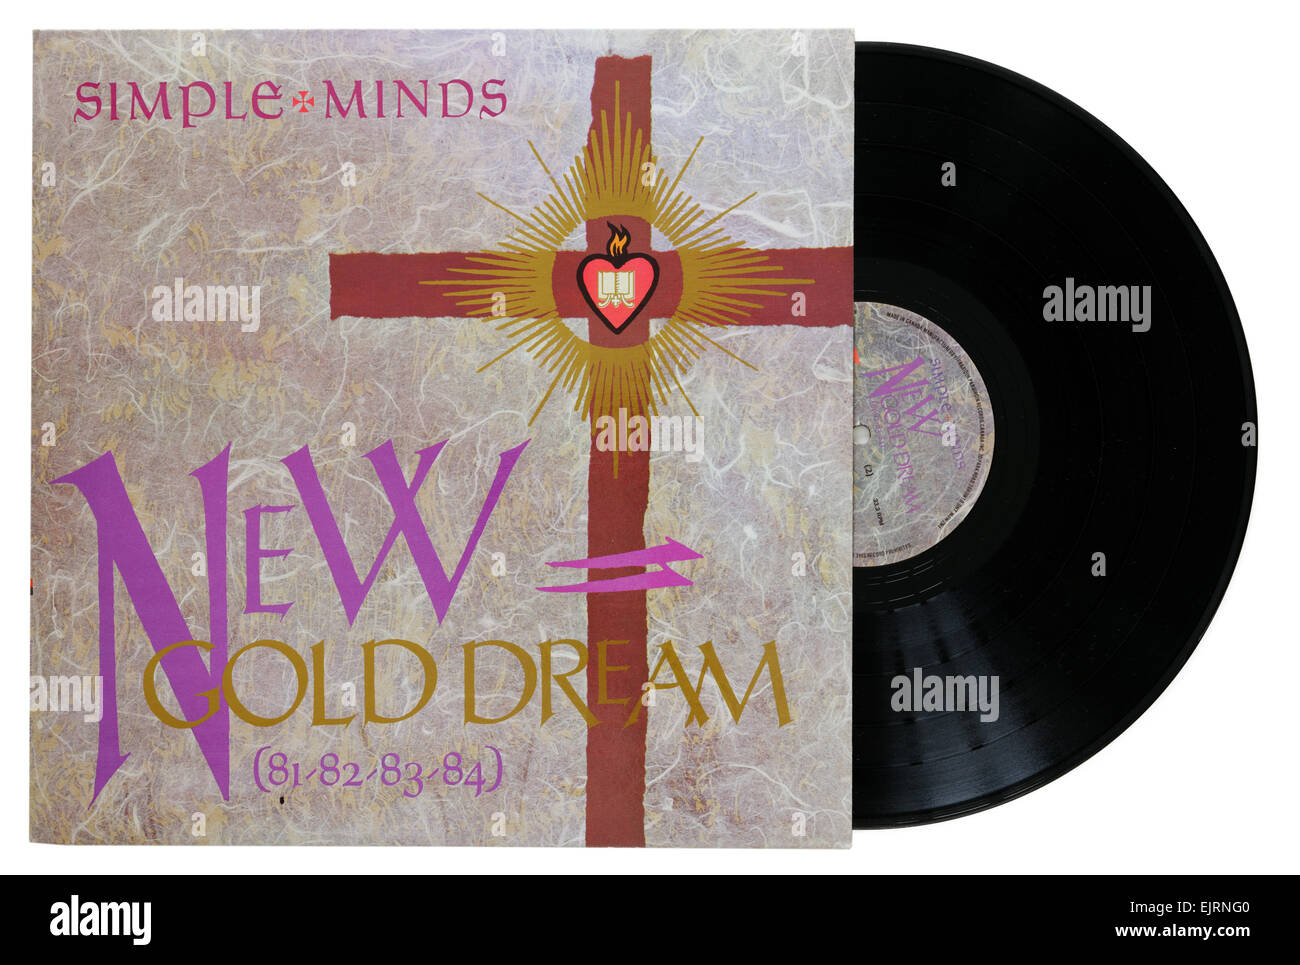 Simple Minds album New Gold Dream - Stock Image